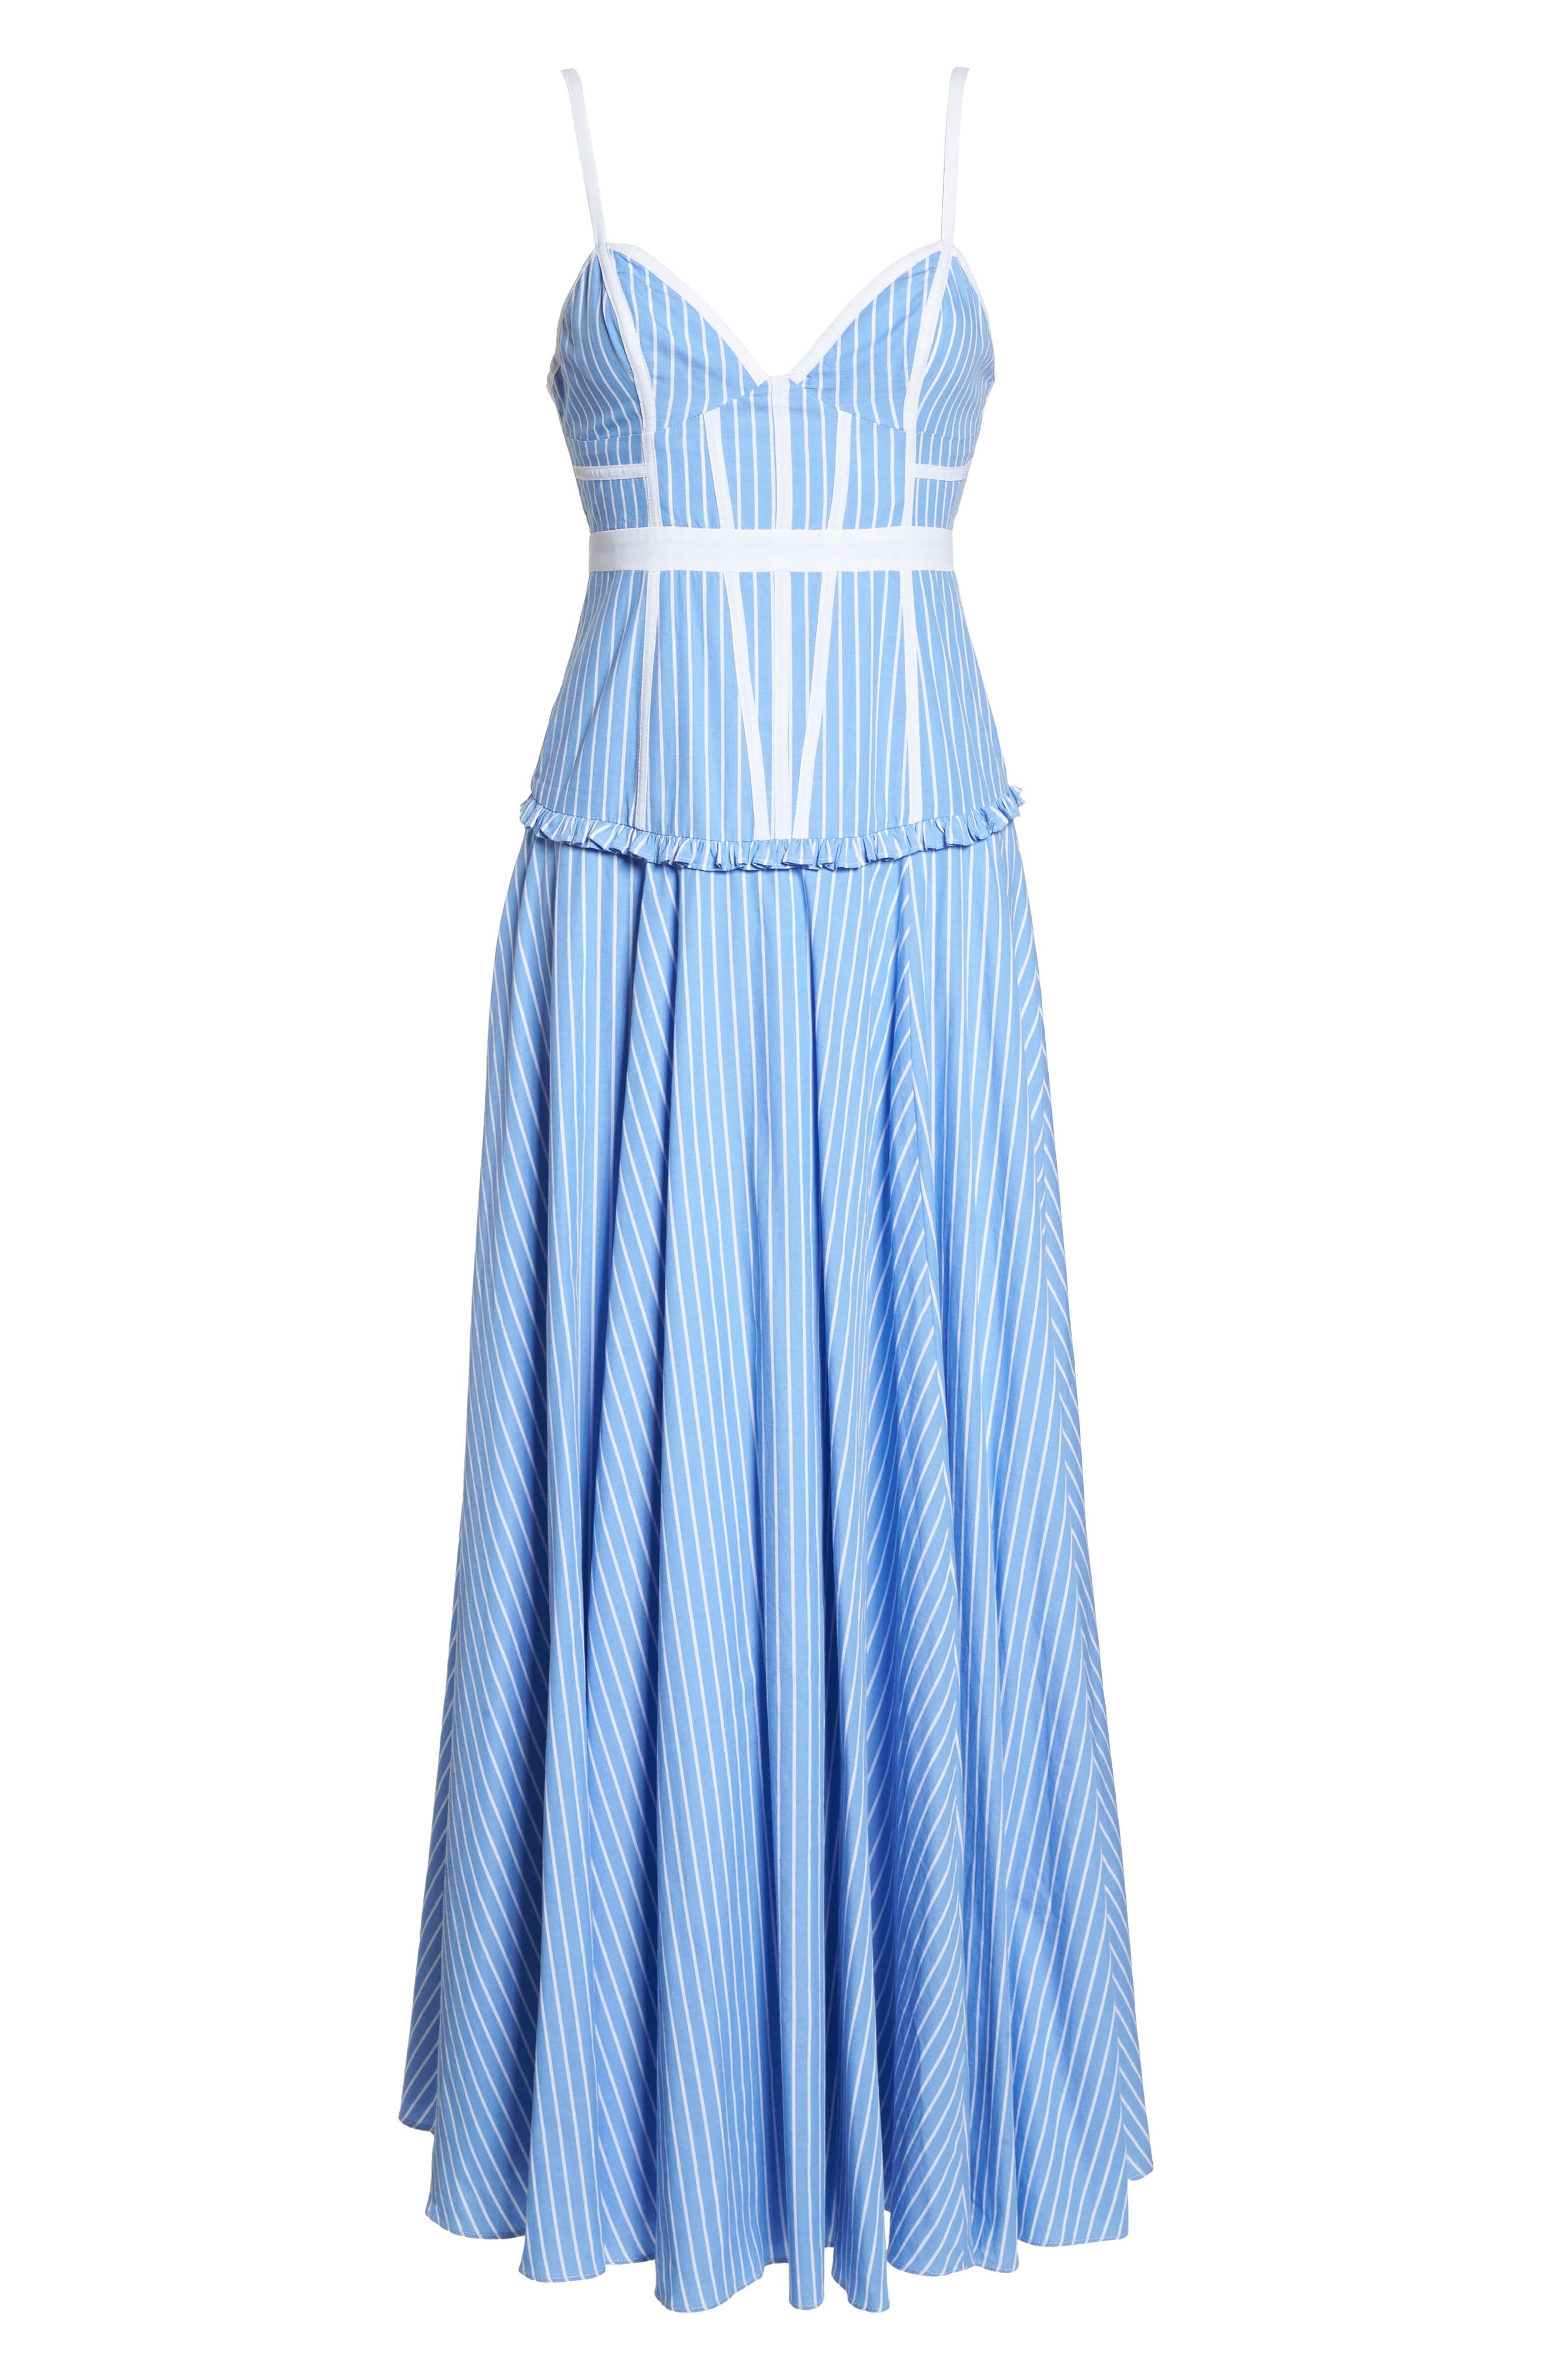 Morrow Stripe Corset Gown,                             Alternate thumbnail 7, color,                             Pale Blue/ White Stripe